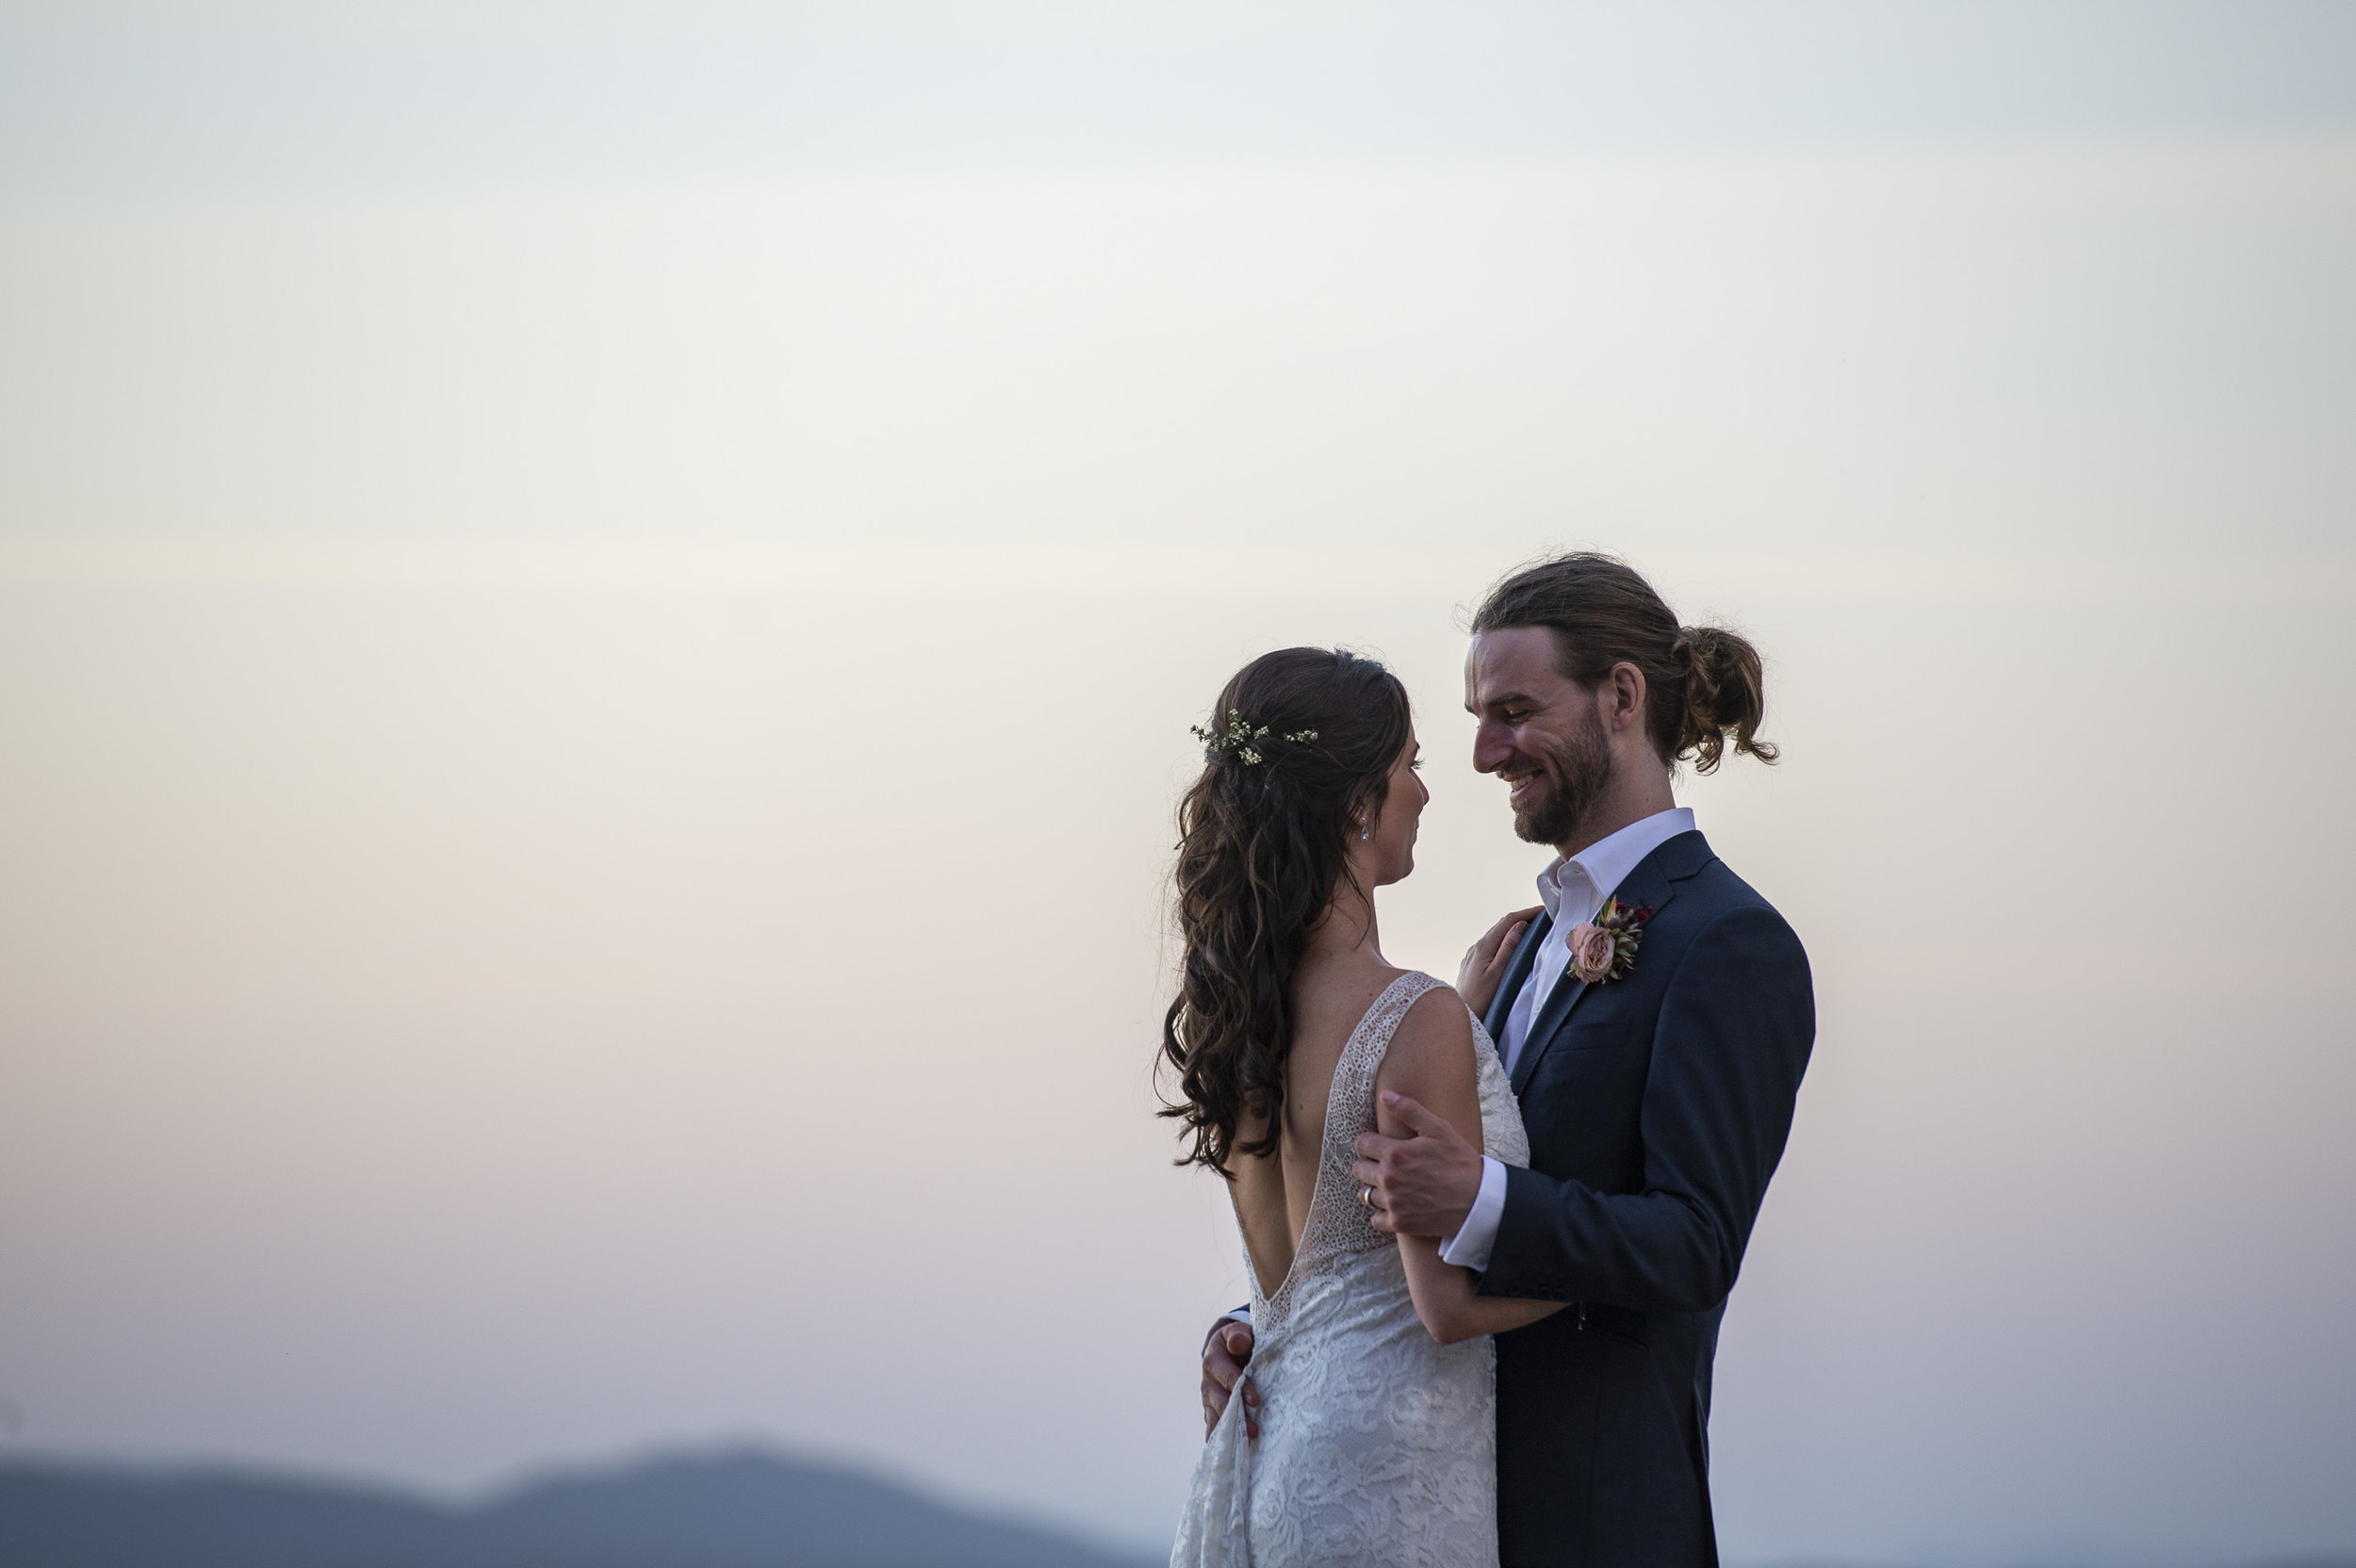 weddings+by+atelier+photography-wedding-34.jpg